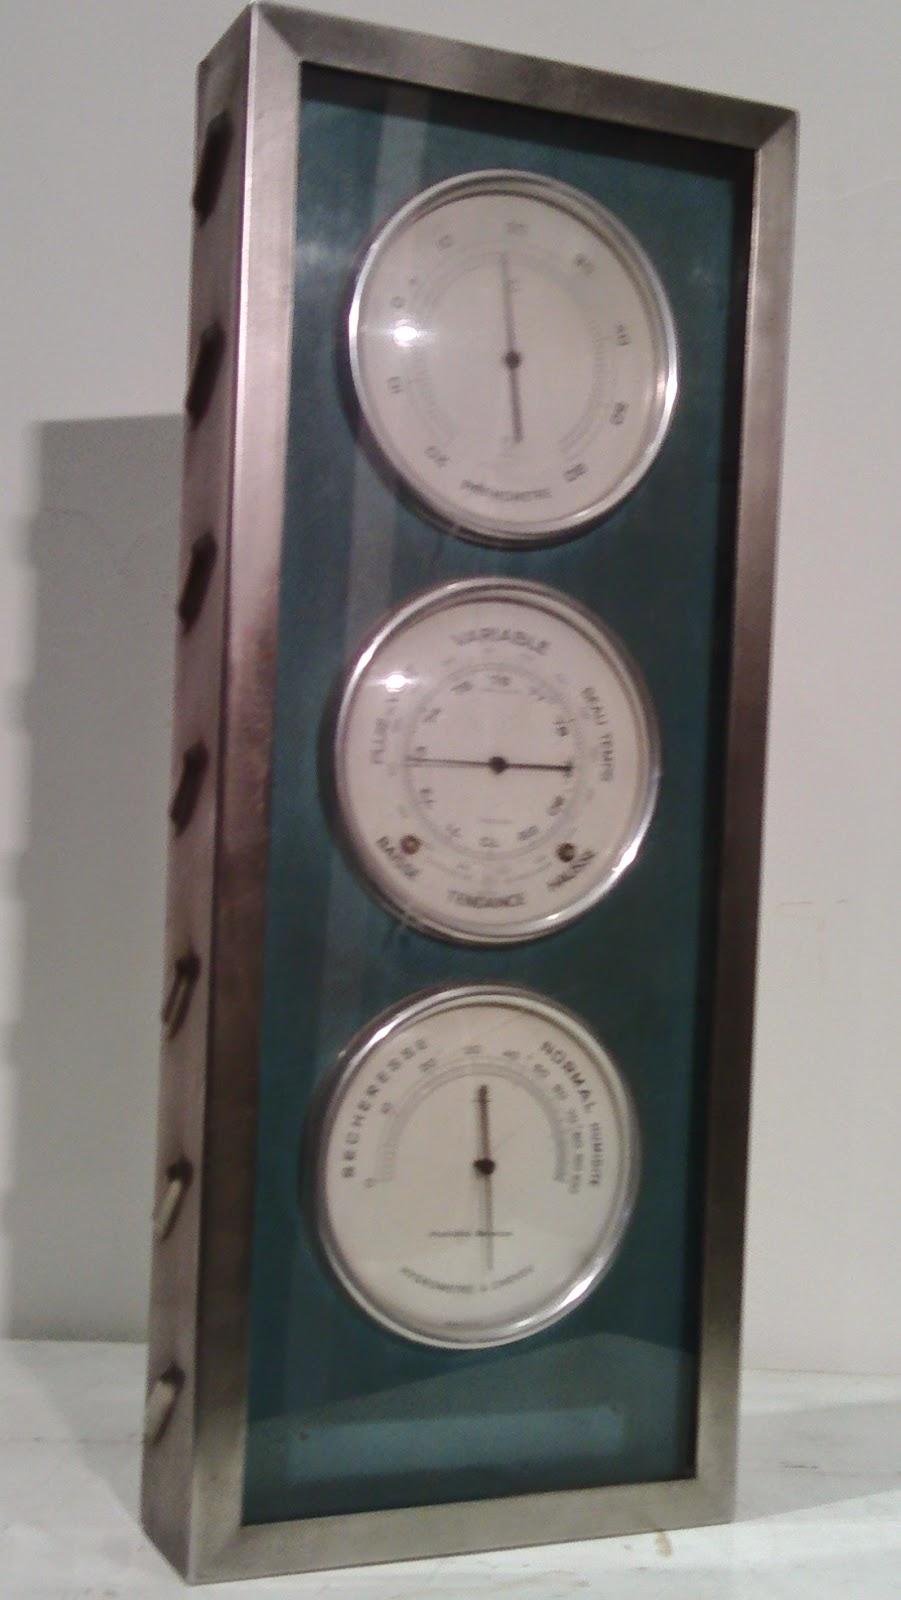 Station m teo naudet ann es 60 barometre thermometre hygrometre a cheveux - Loft industriel playing circle ...